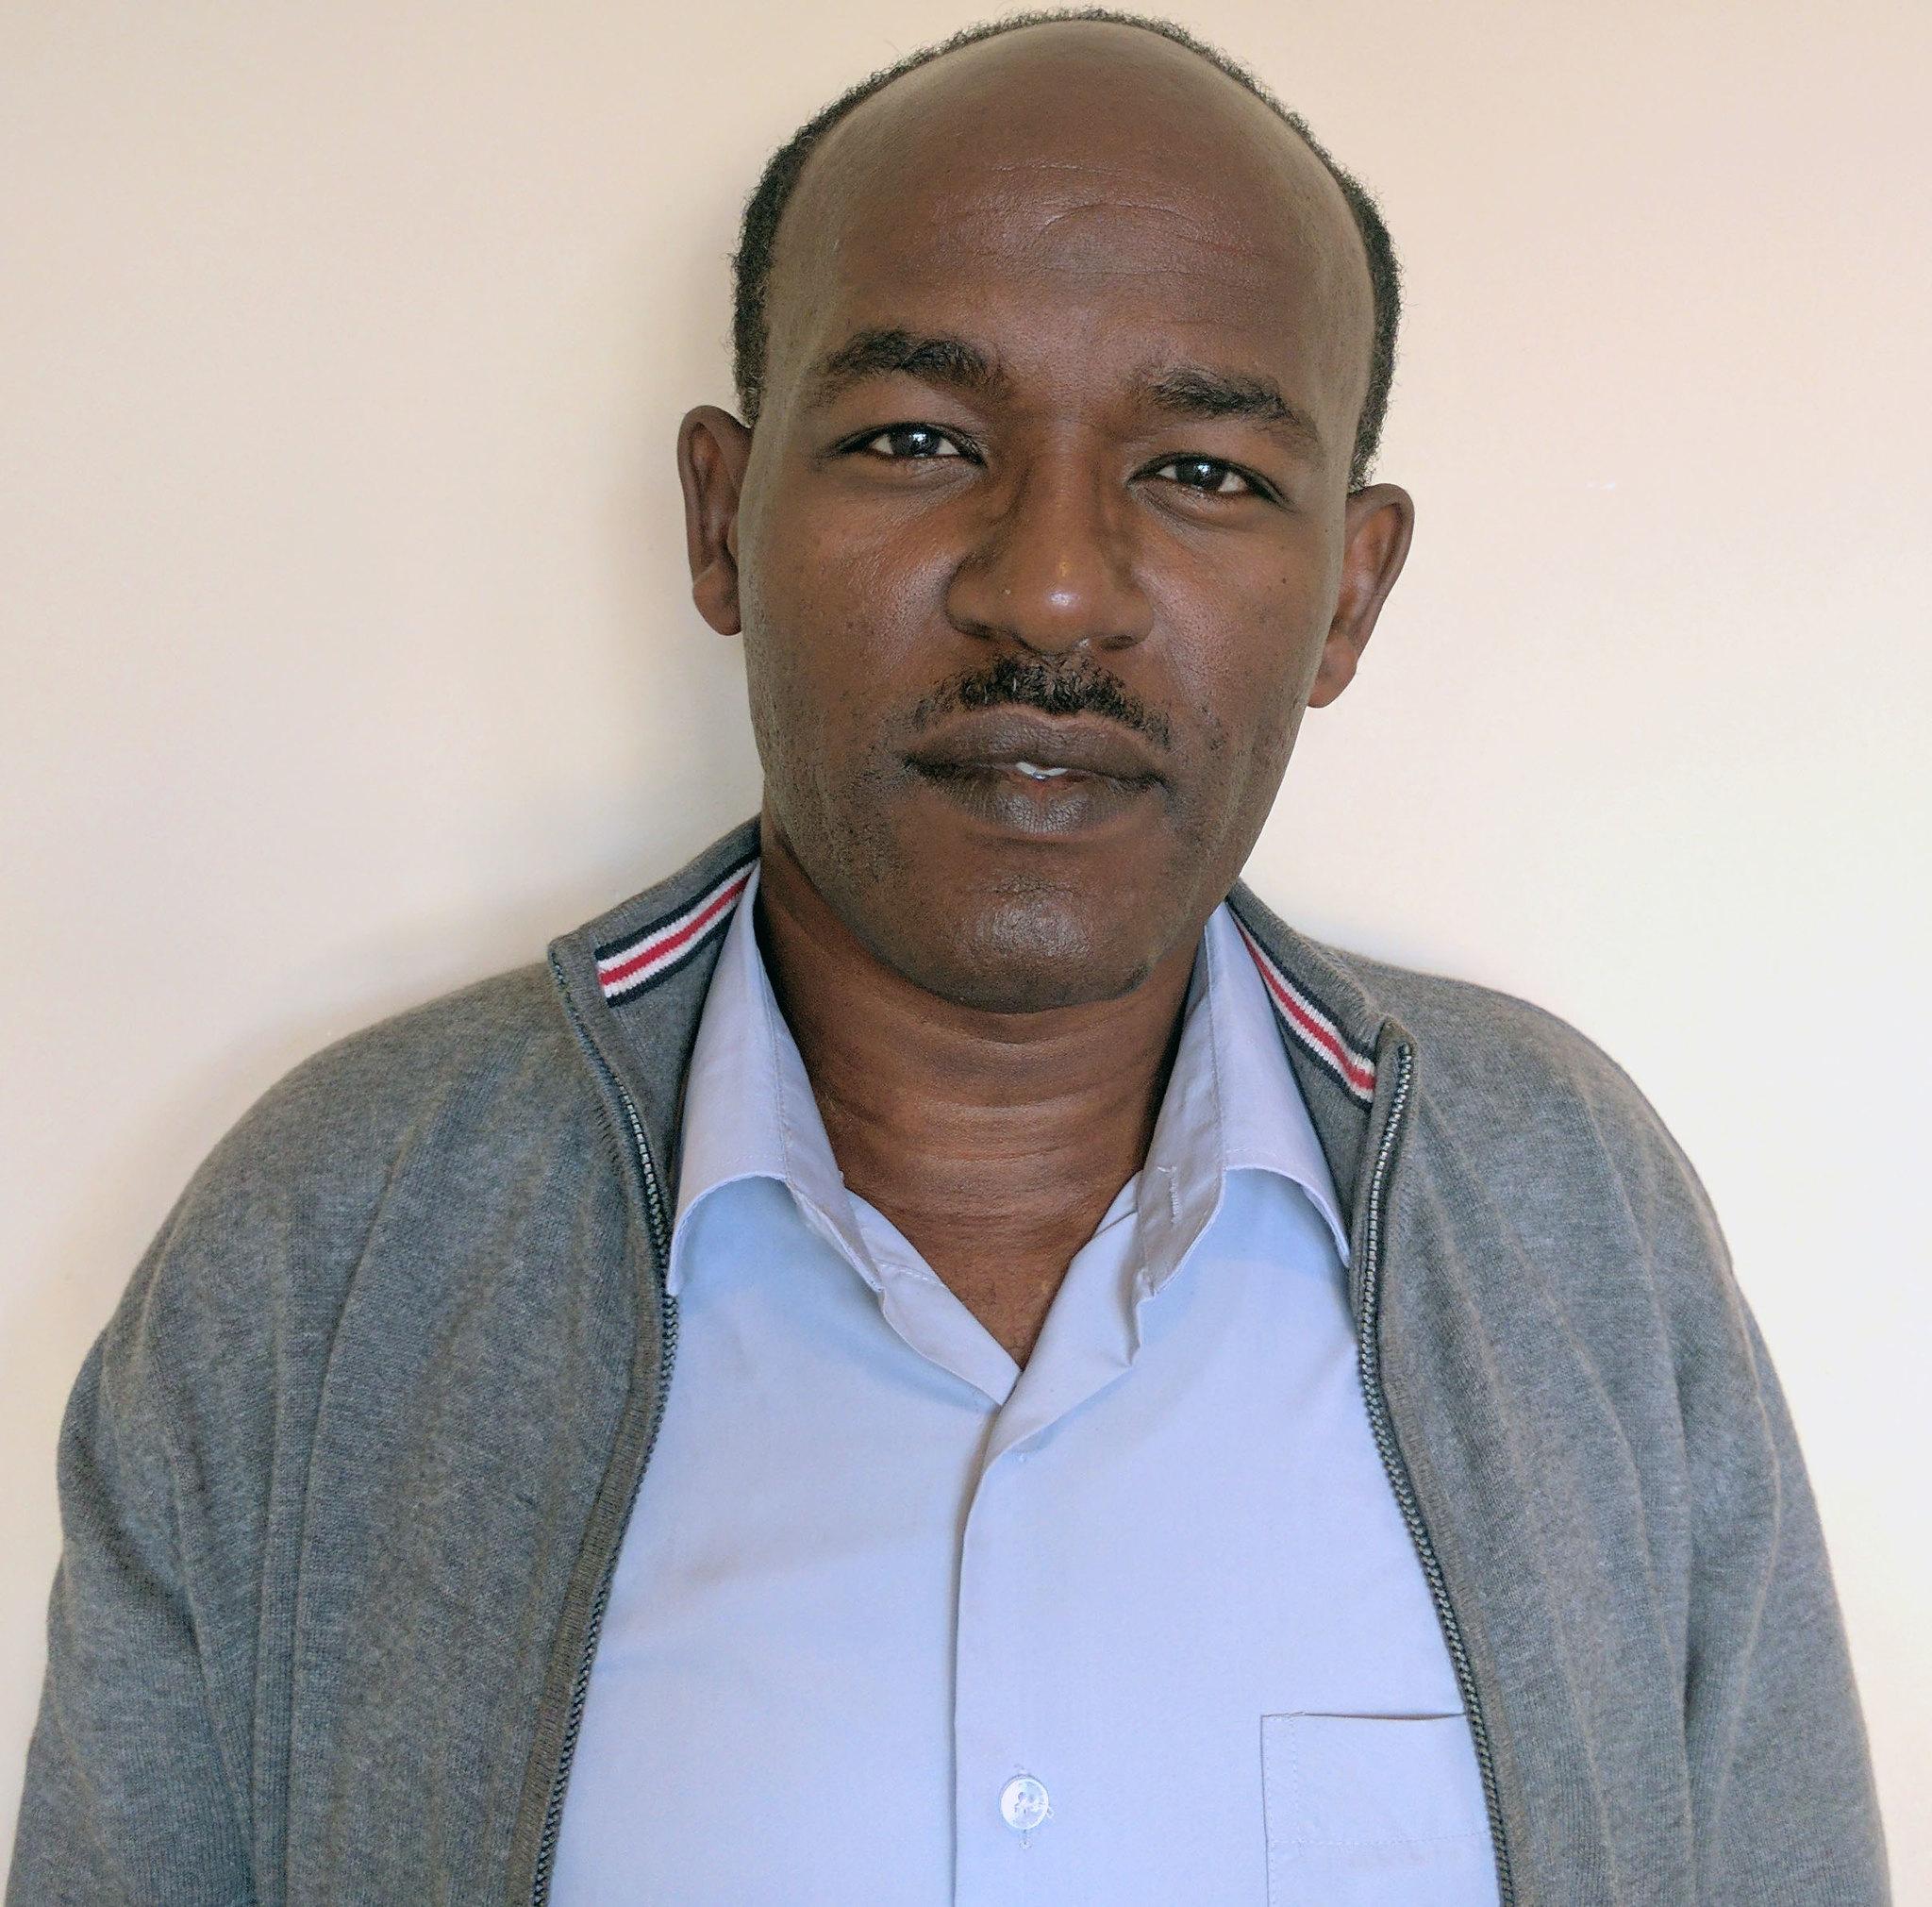 Tekleyohannis Birihanu (Phd) is African Chicken Genetic Gains' (ACGG) Sub National Coordinator in the Southern Nations and Nationalities Region in Ethiopia. (photo credit: ILRI / M. Tsegaye)